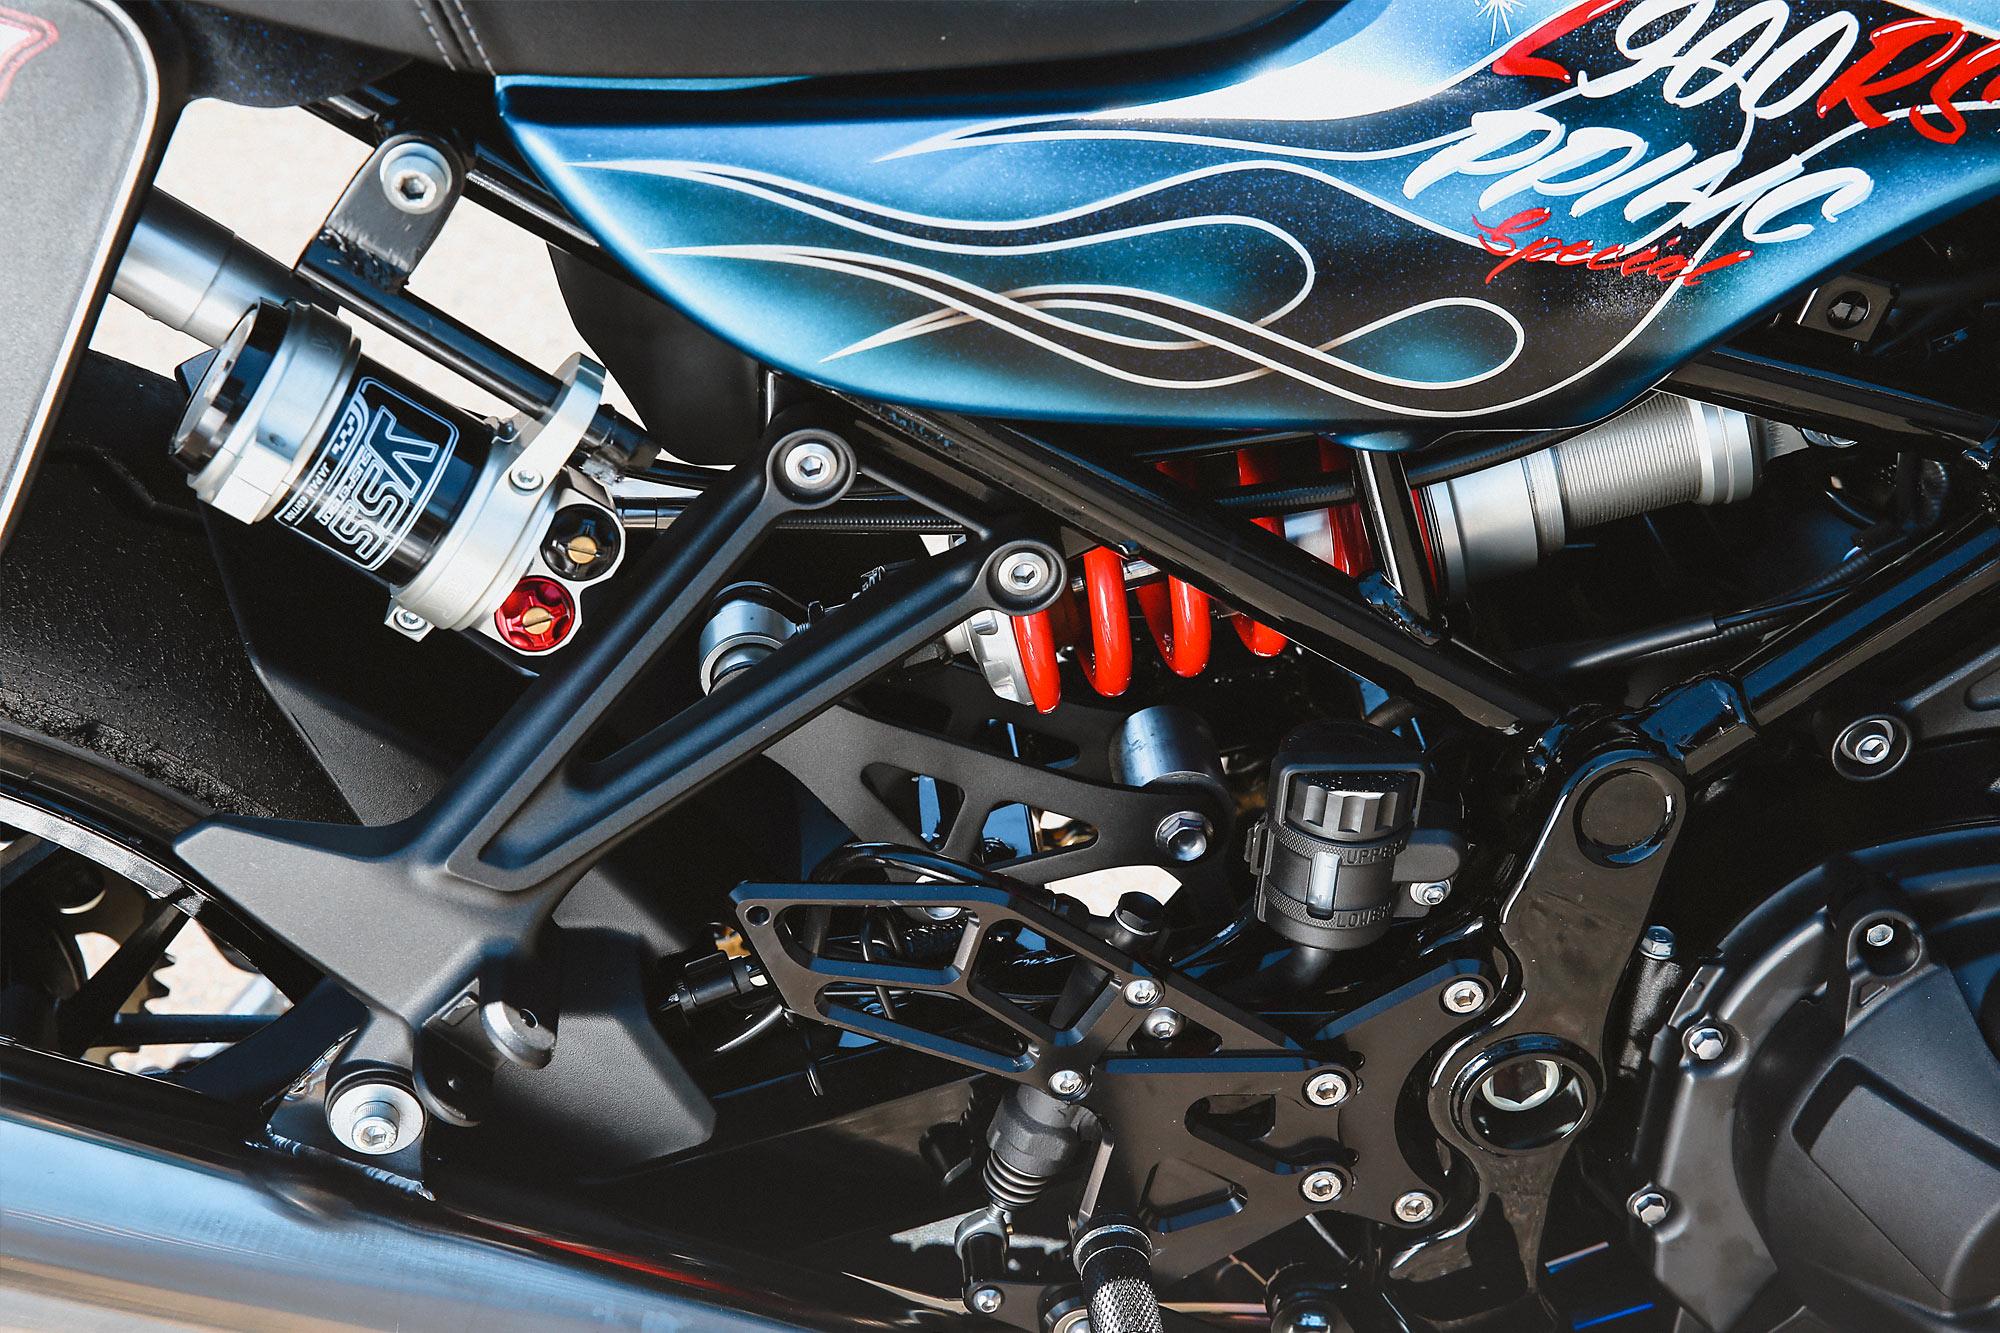 Mountain Biking Blue Thunder S Mean Kawasaki Z900rs Pikes Peak Special Pipeburn